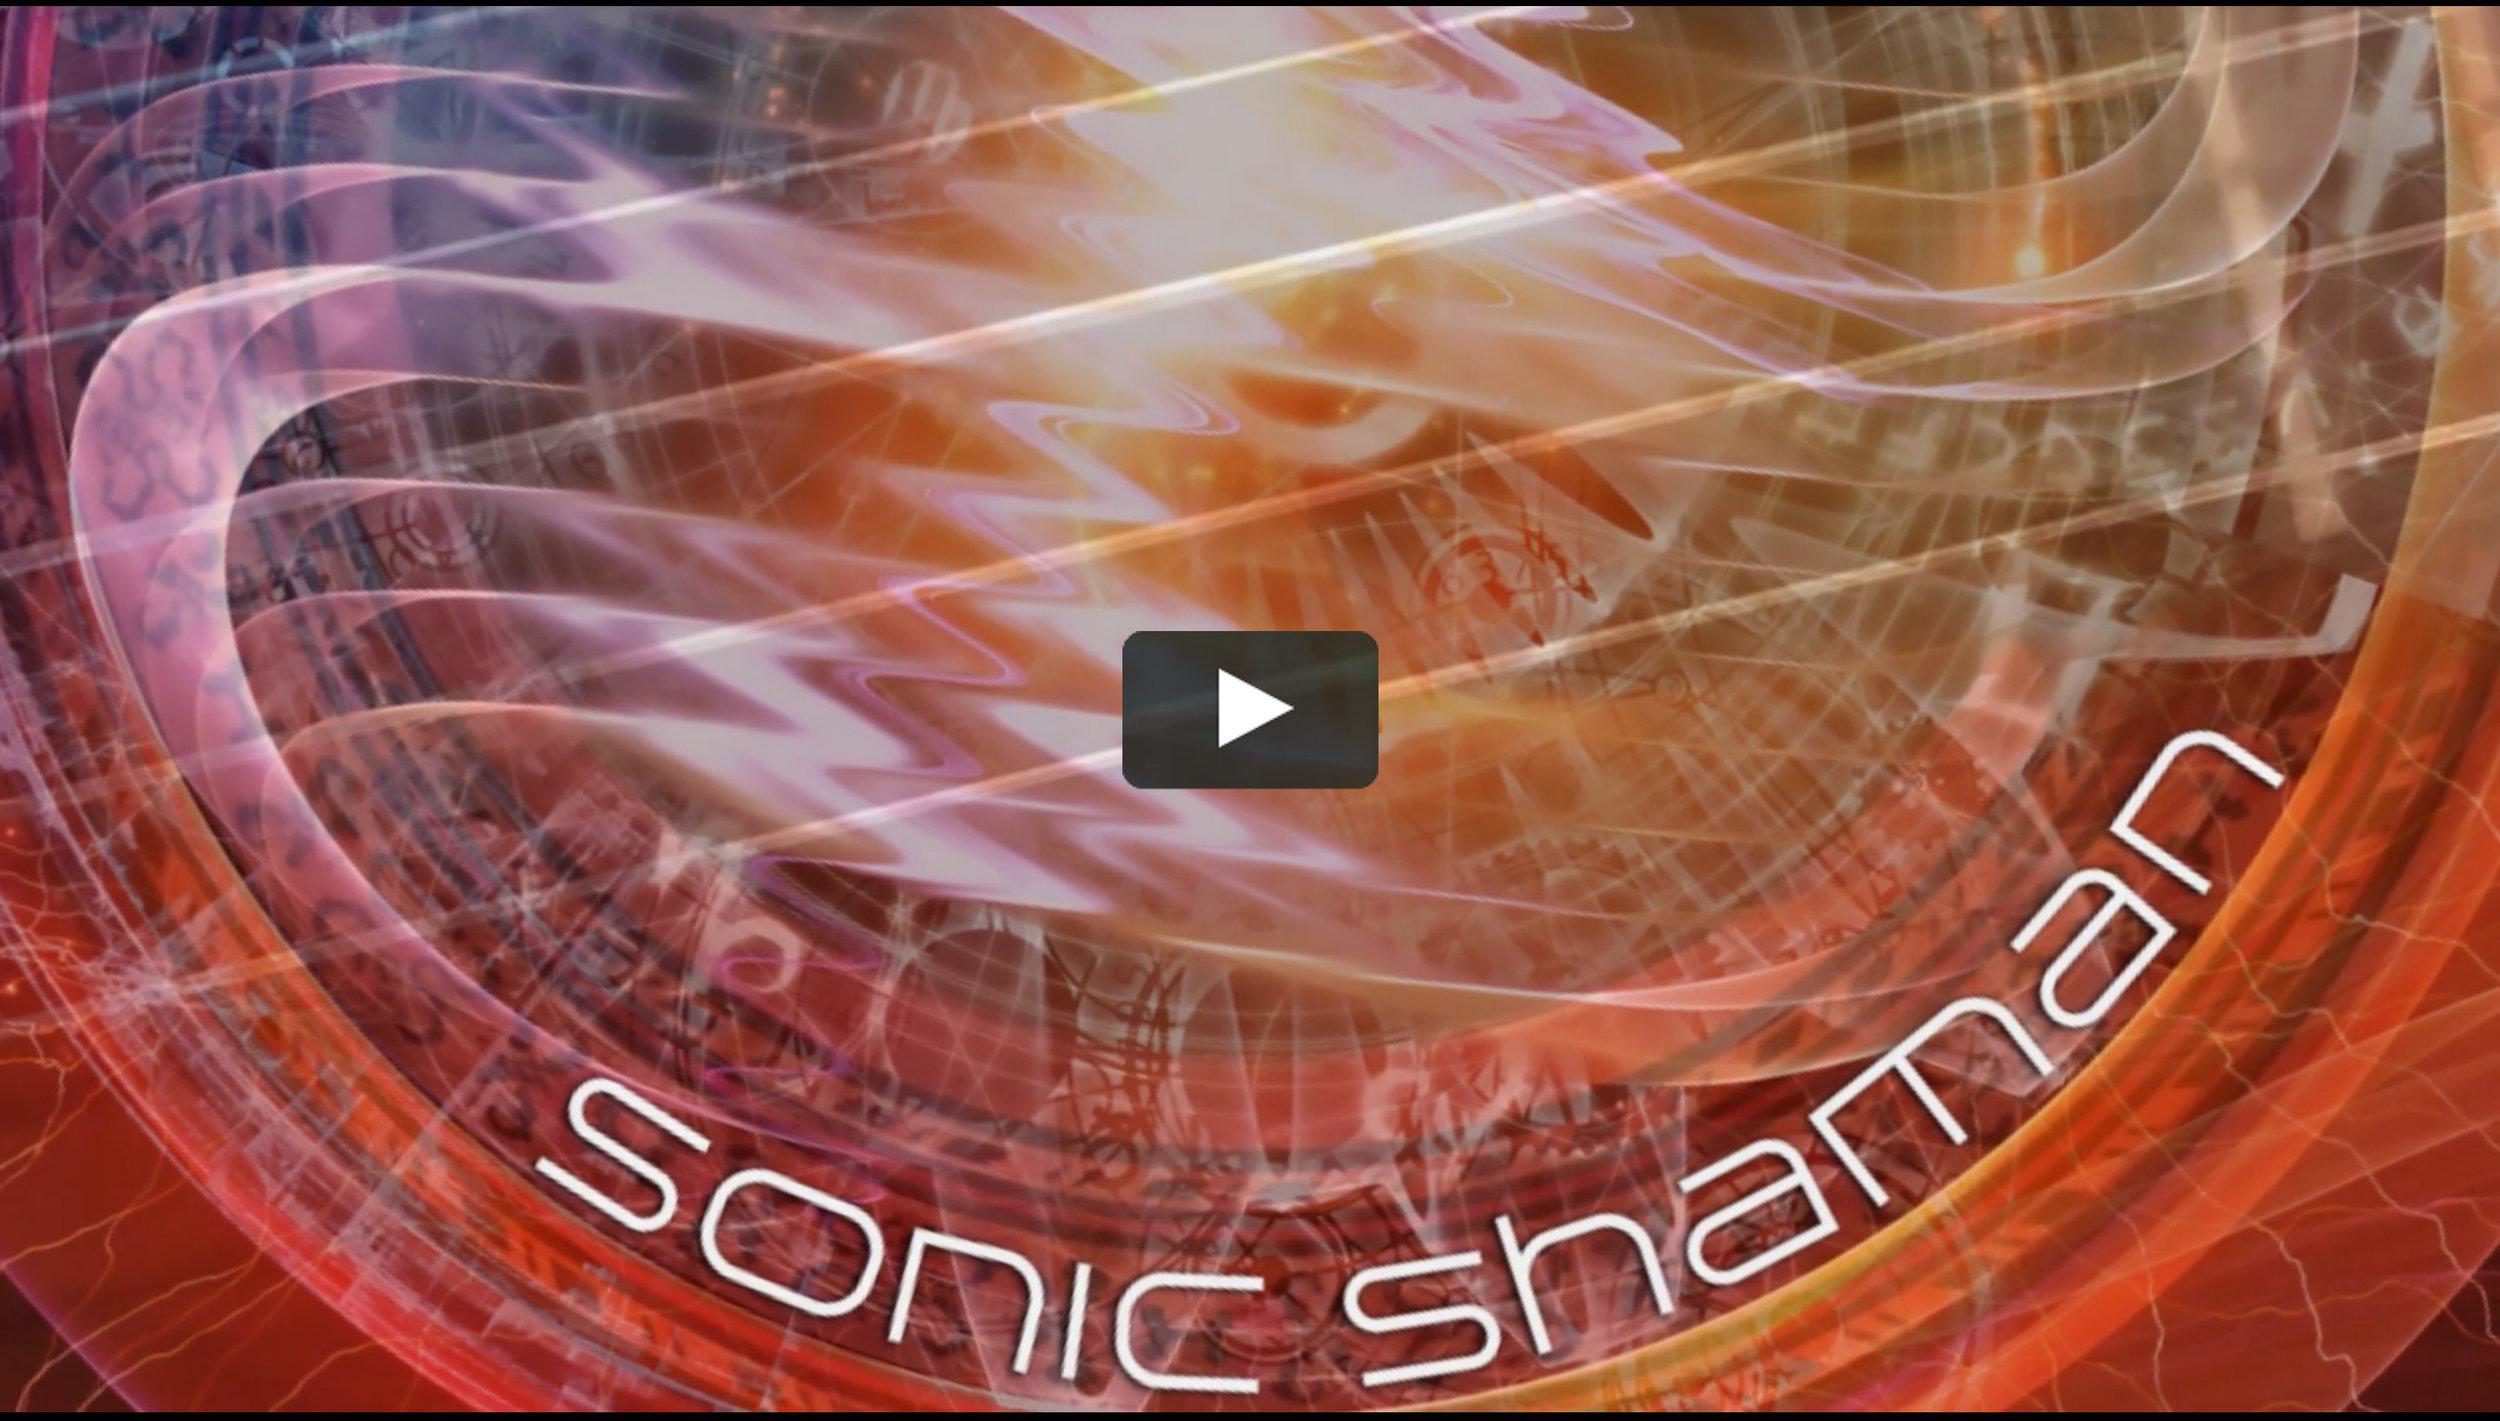 Sonic Shaman video.jpg